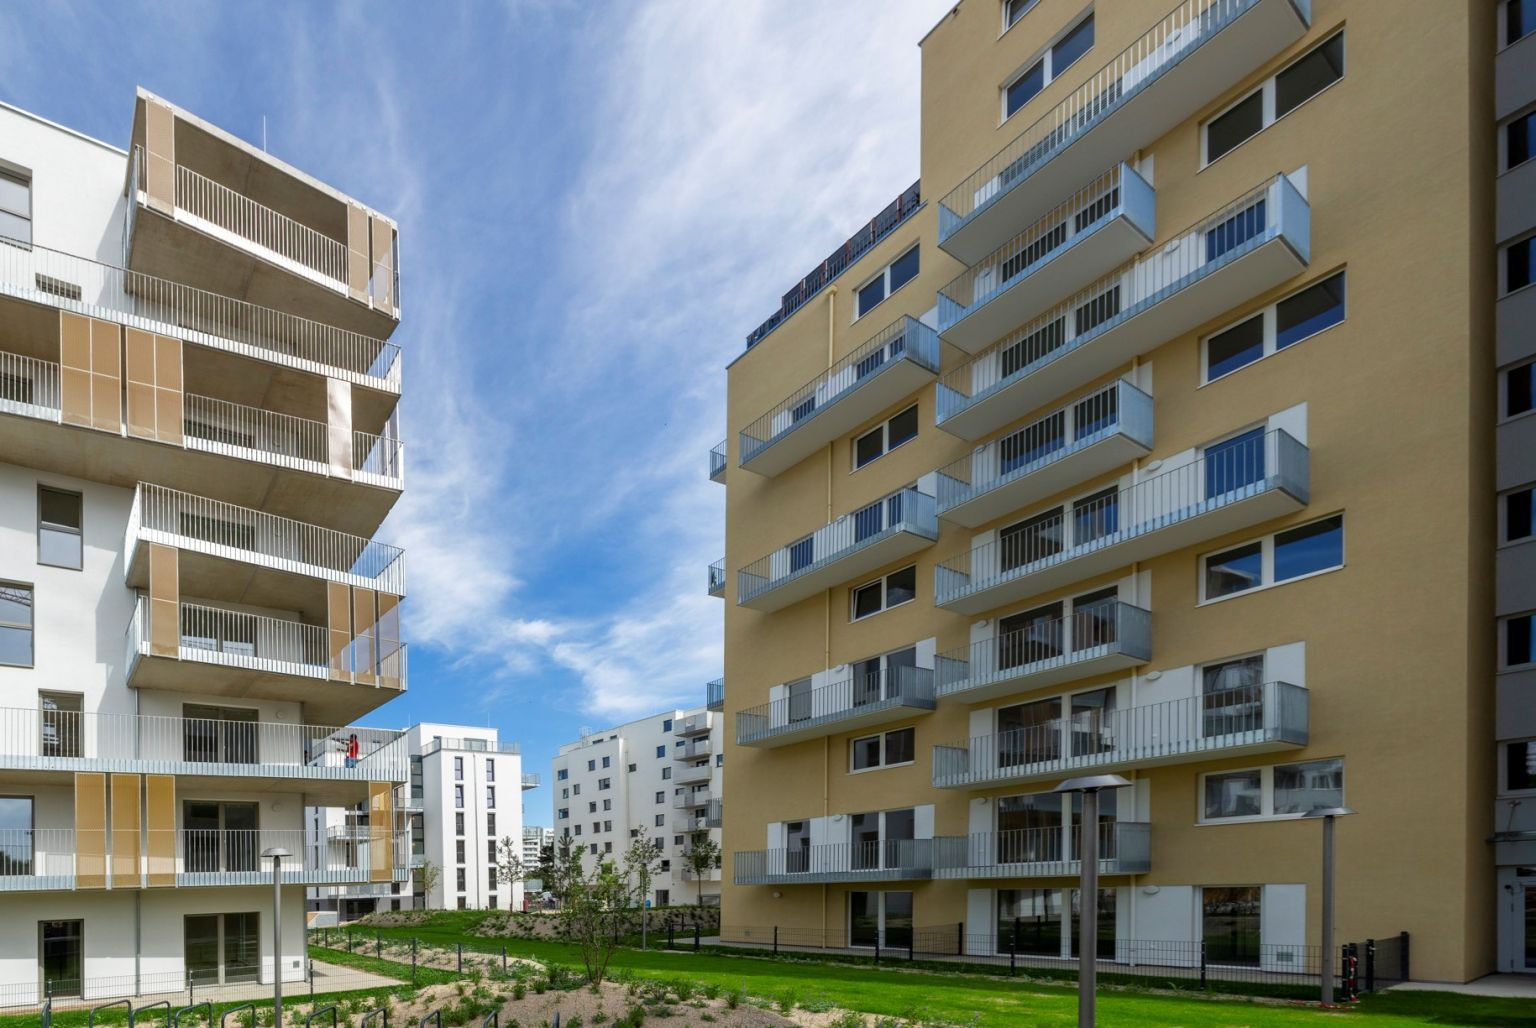 KIBB Immobilien übergibt Wohnbau in Wien-Liesing